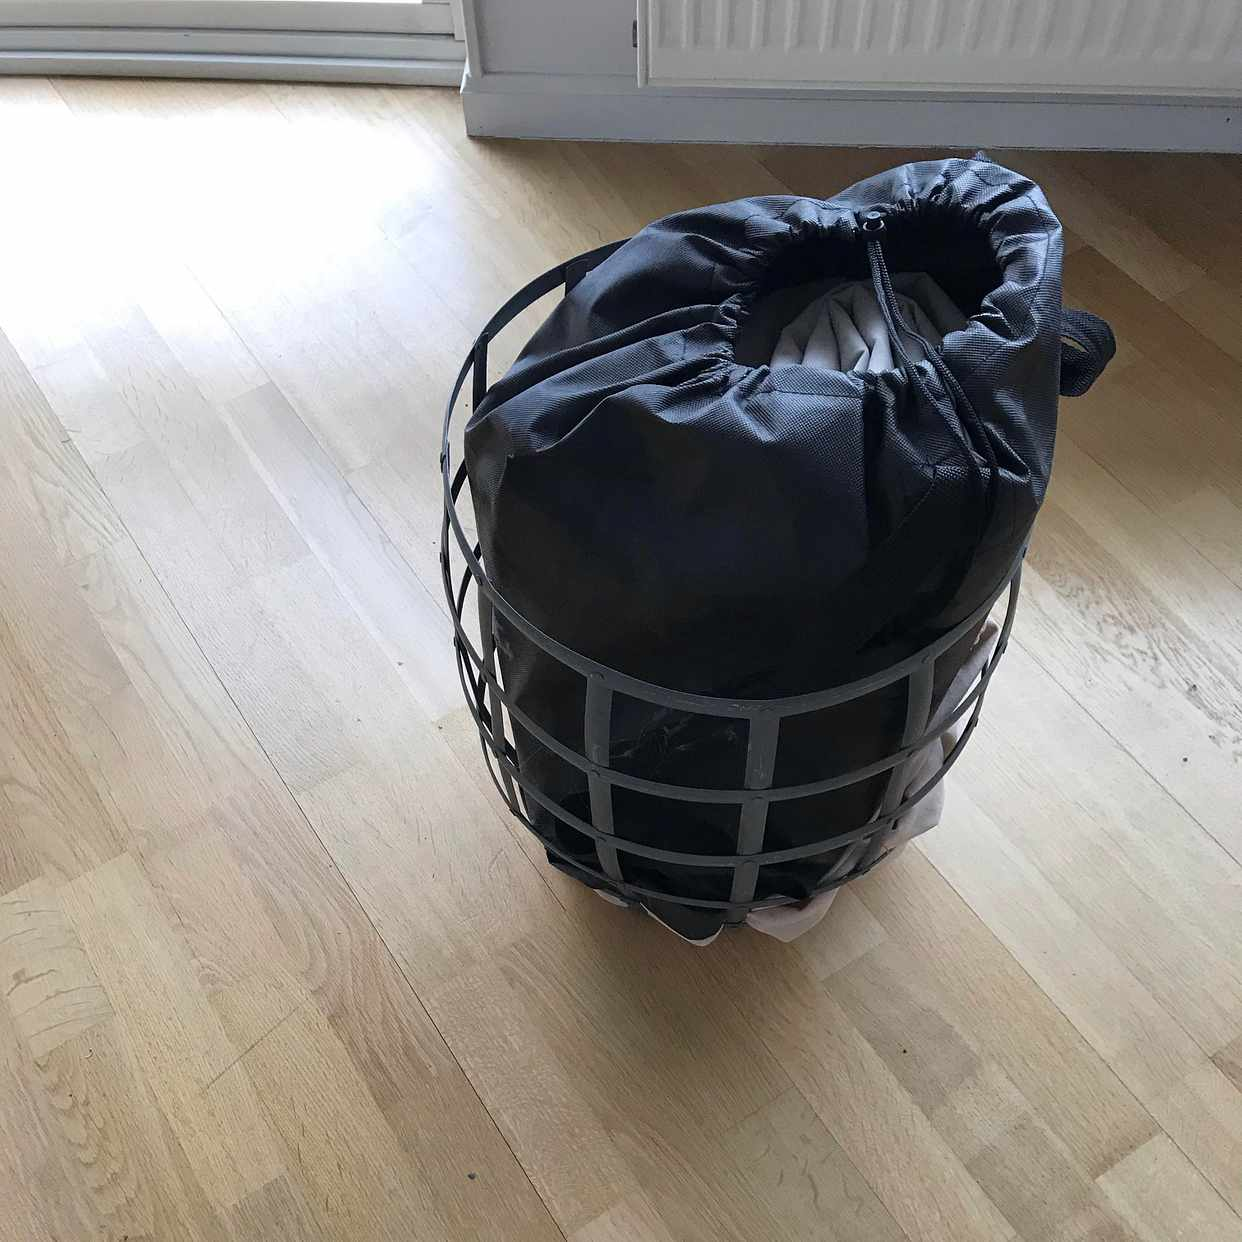 image of mattress + laundry basket - Stockholm